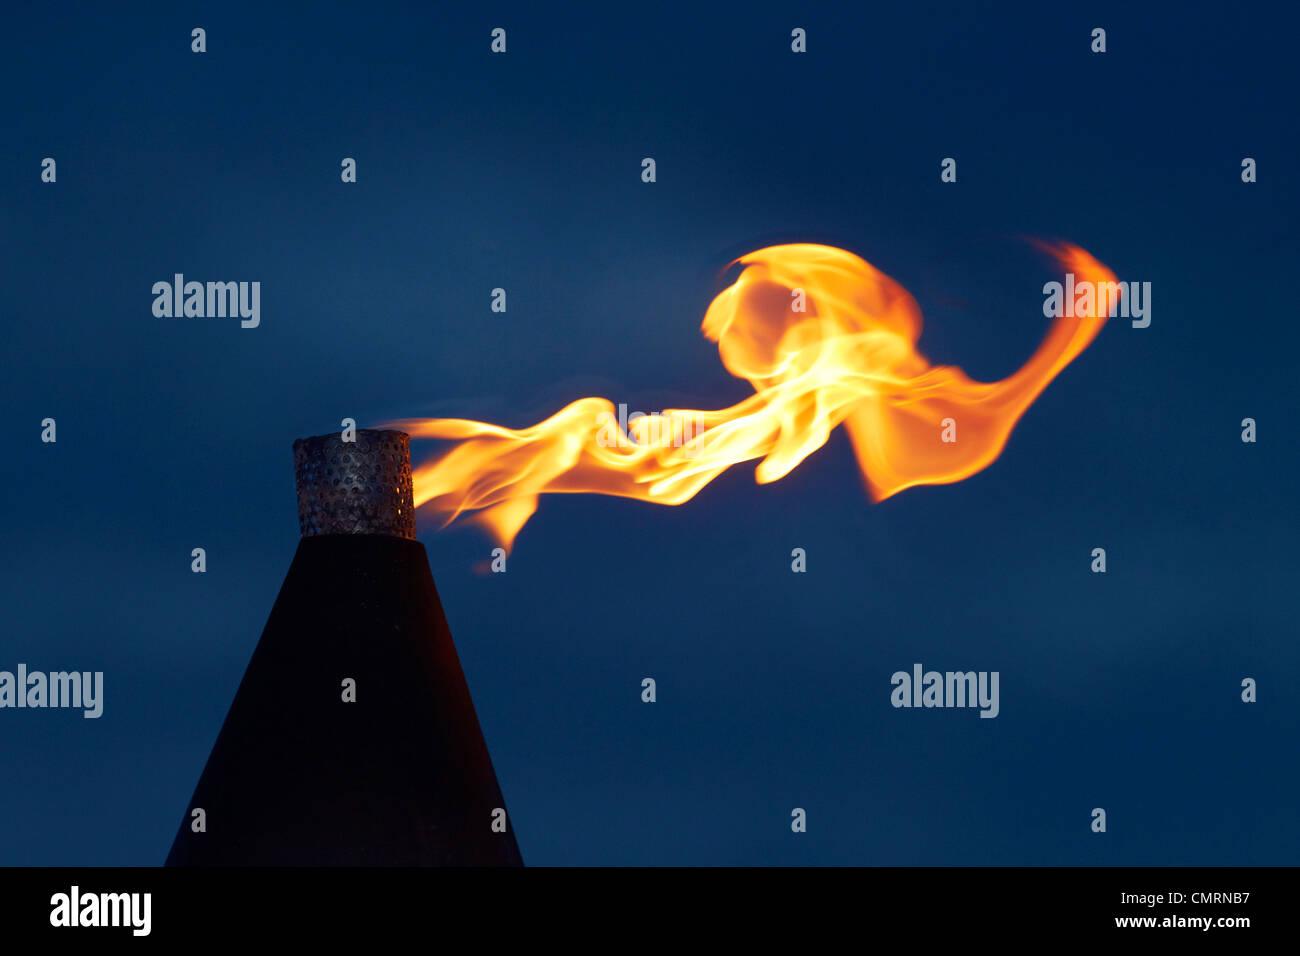 Flame on kerosene lantern, Crusoe's Retreat, Coral Coast, Viti Levu, Fiji, South Pacific - Stock Image